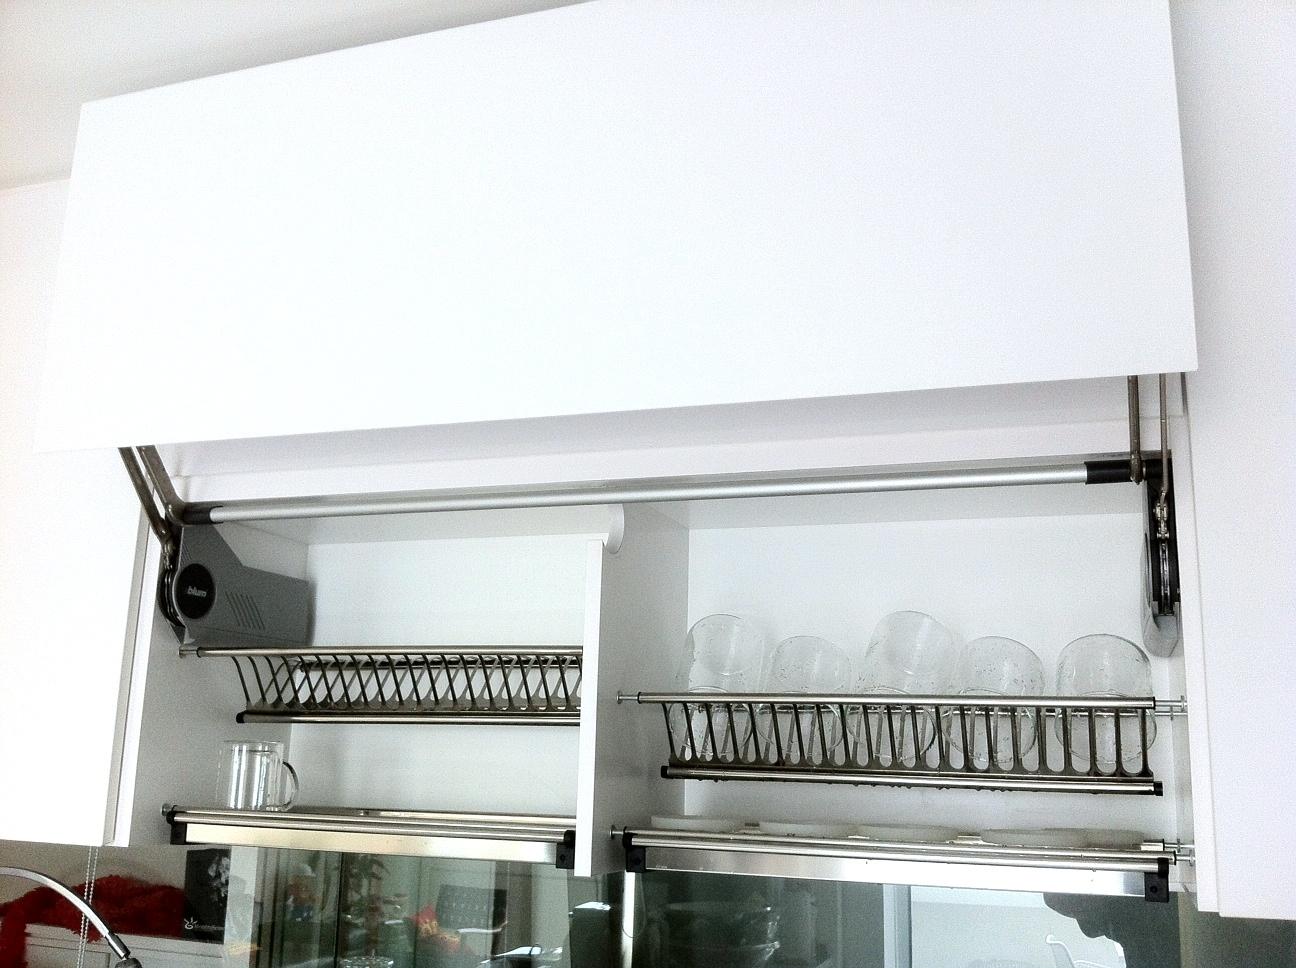 dekorasi rak kabinet dapur bahan stainless sebagai storage